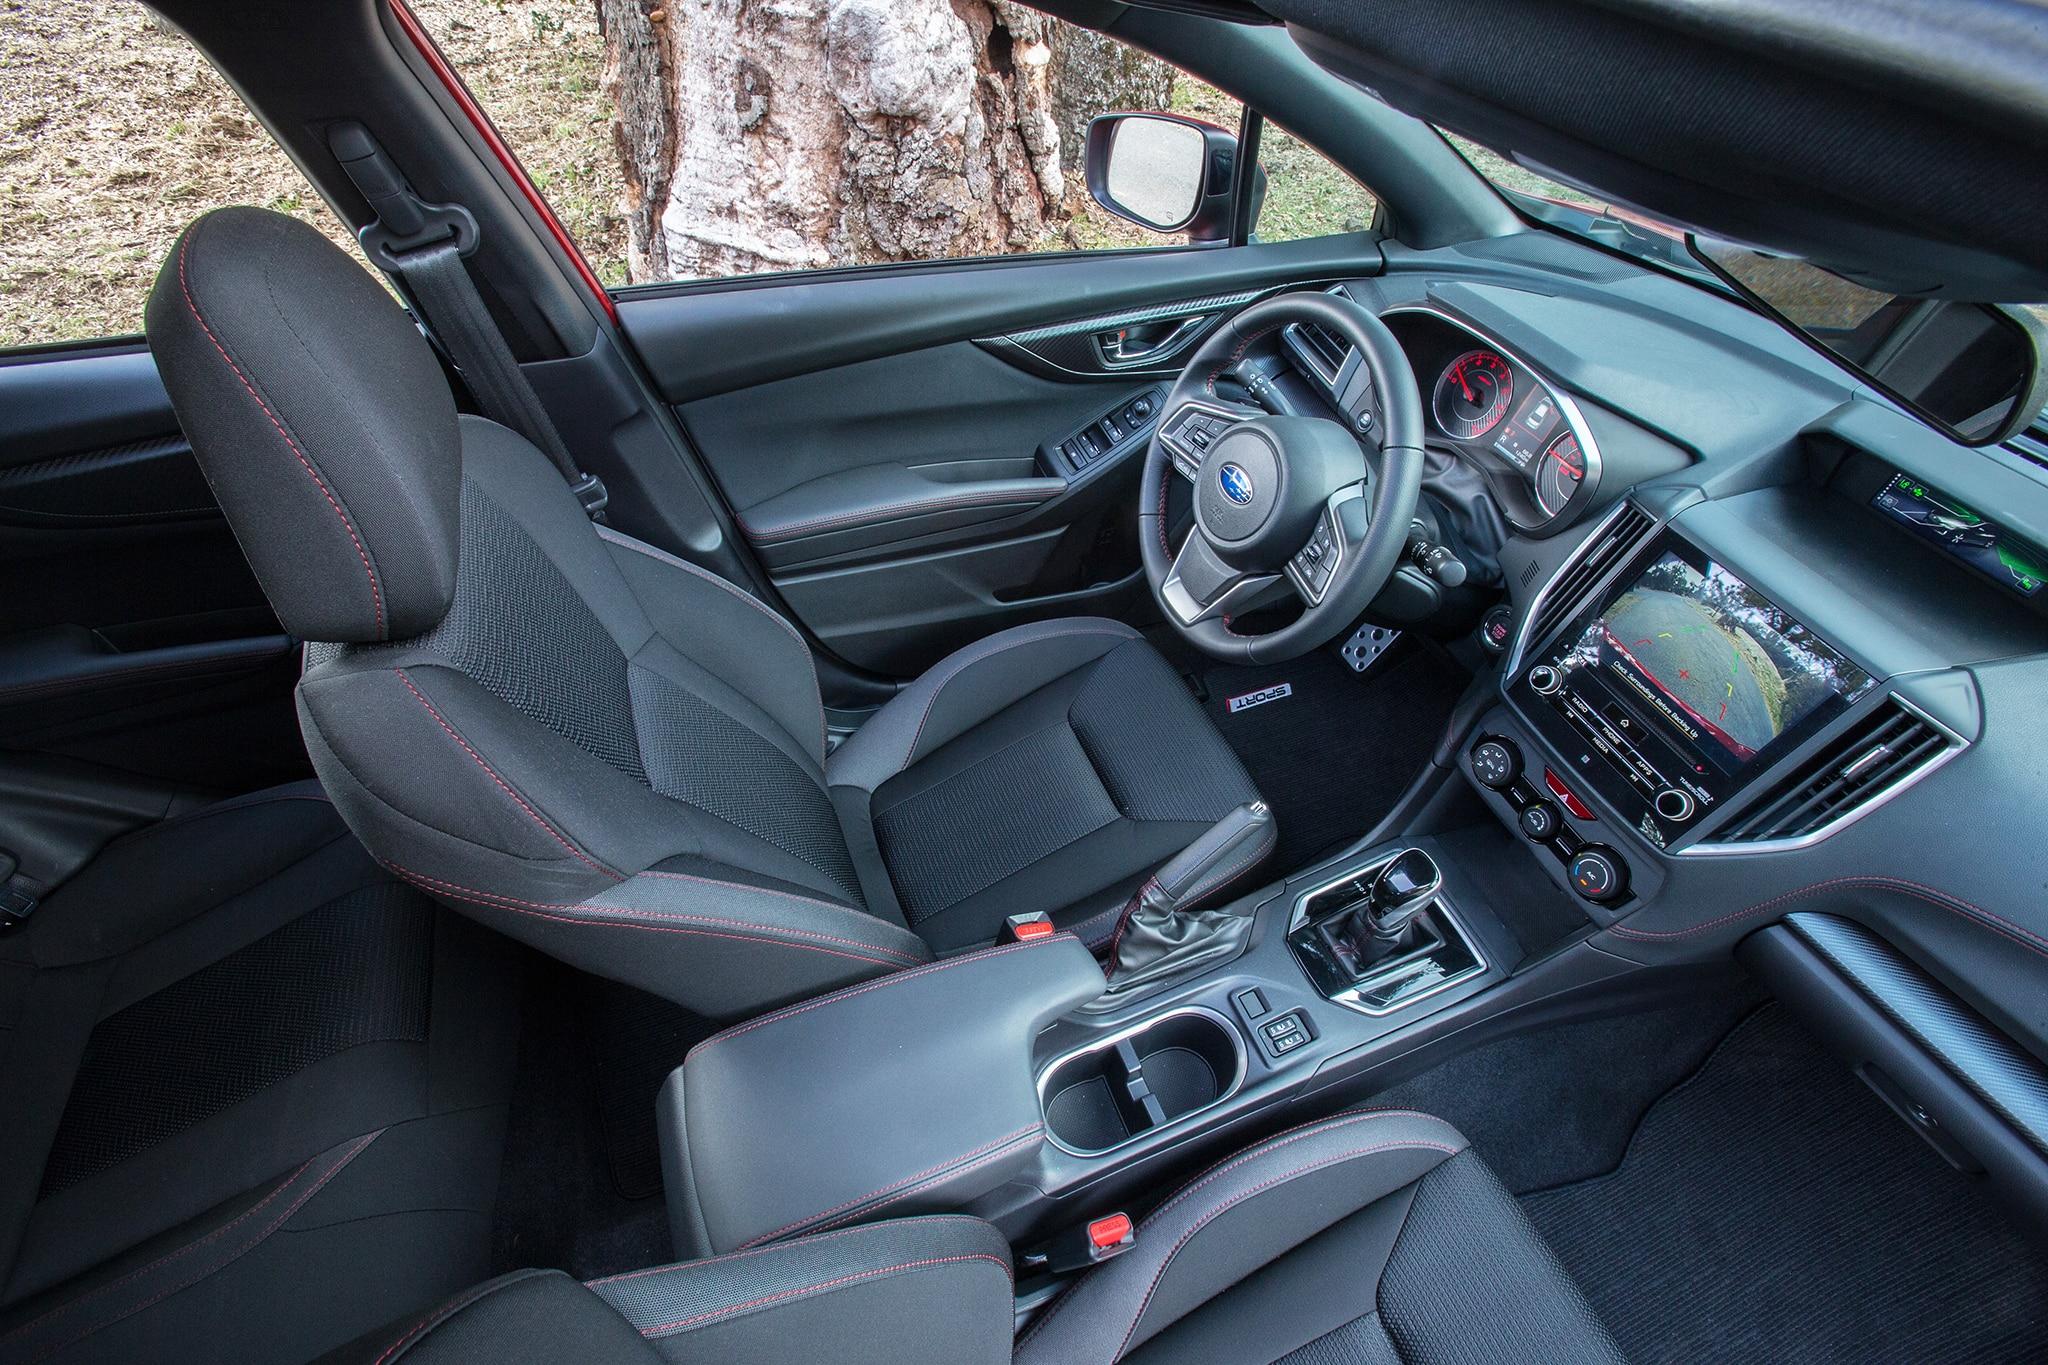 100 Subaru Impreza 2017 Interior 2017 Subaru Impreza Cars Exclusive Videos And Photos